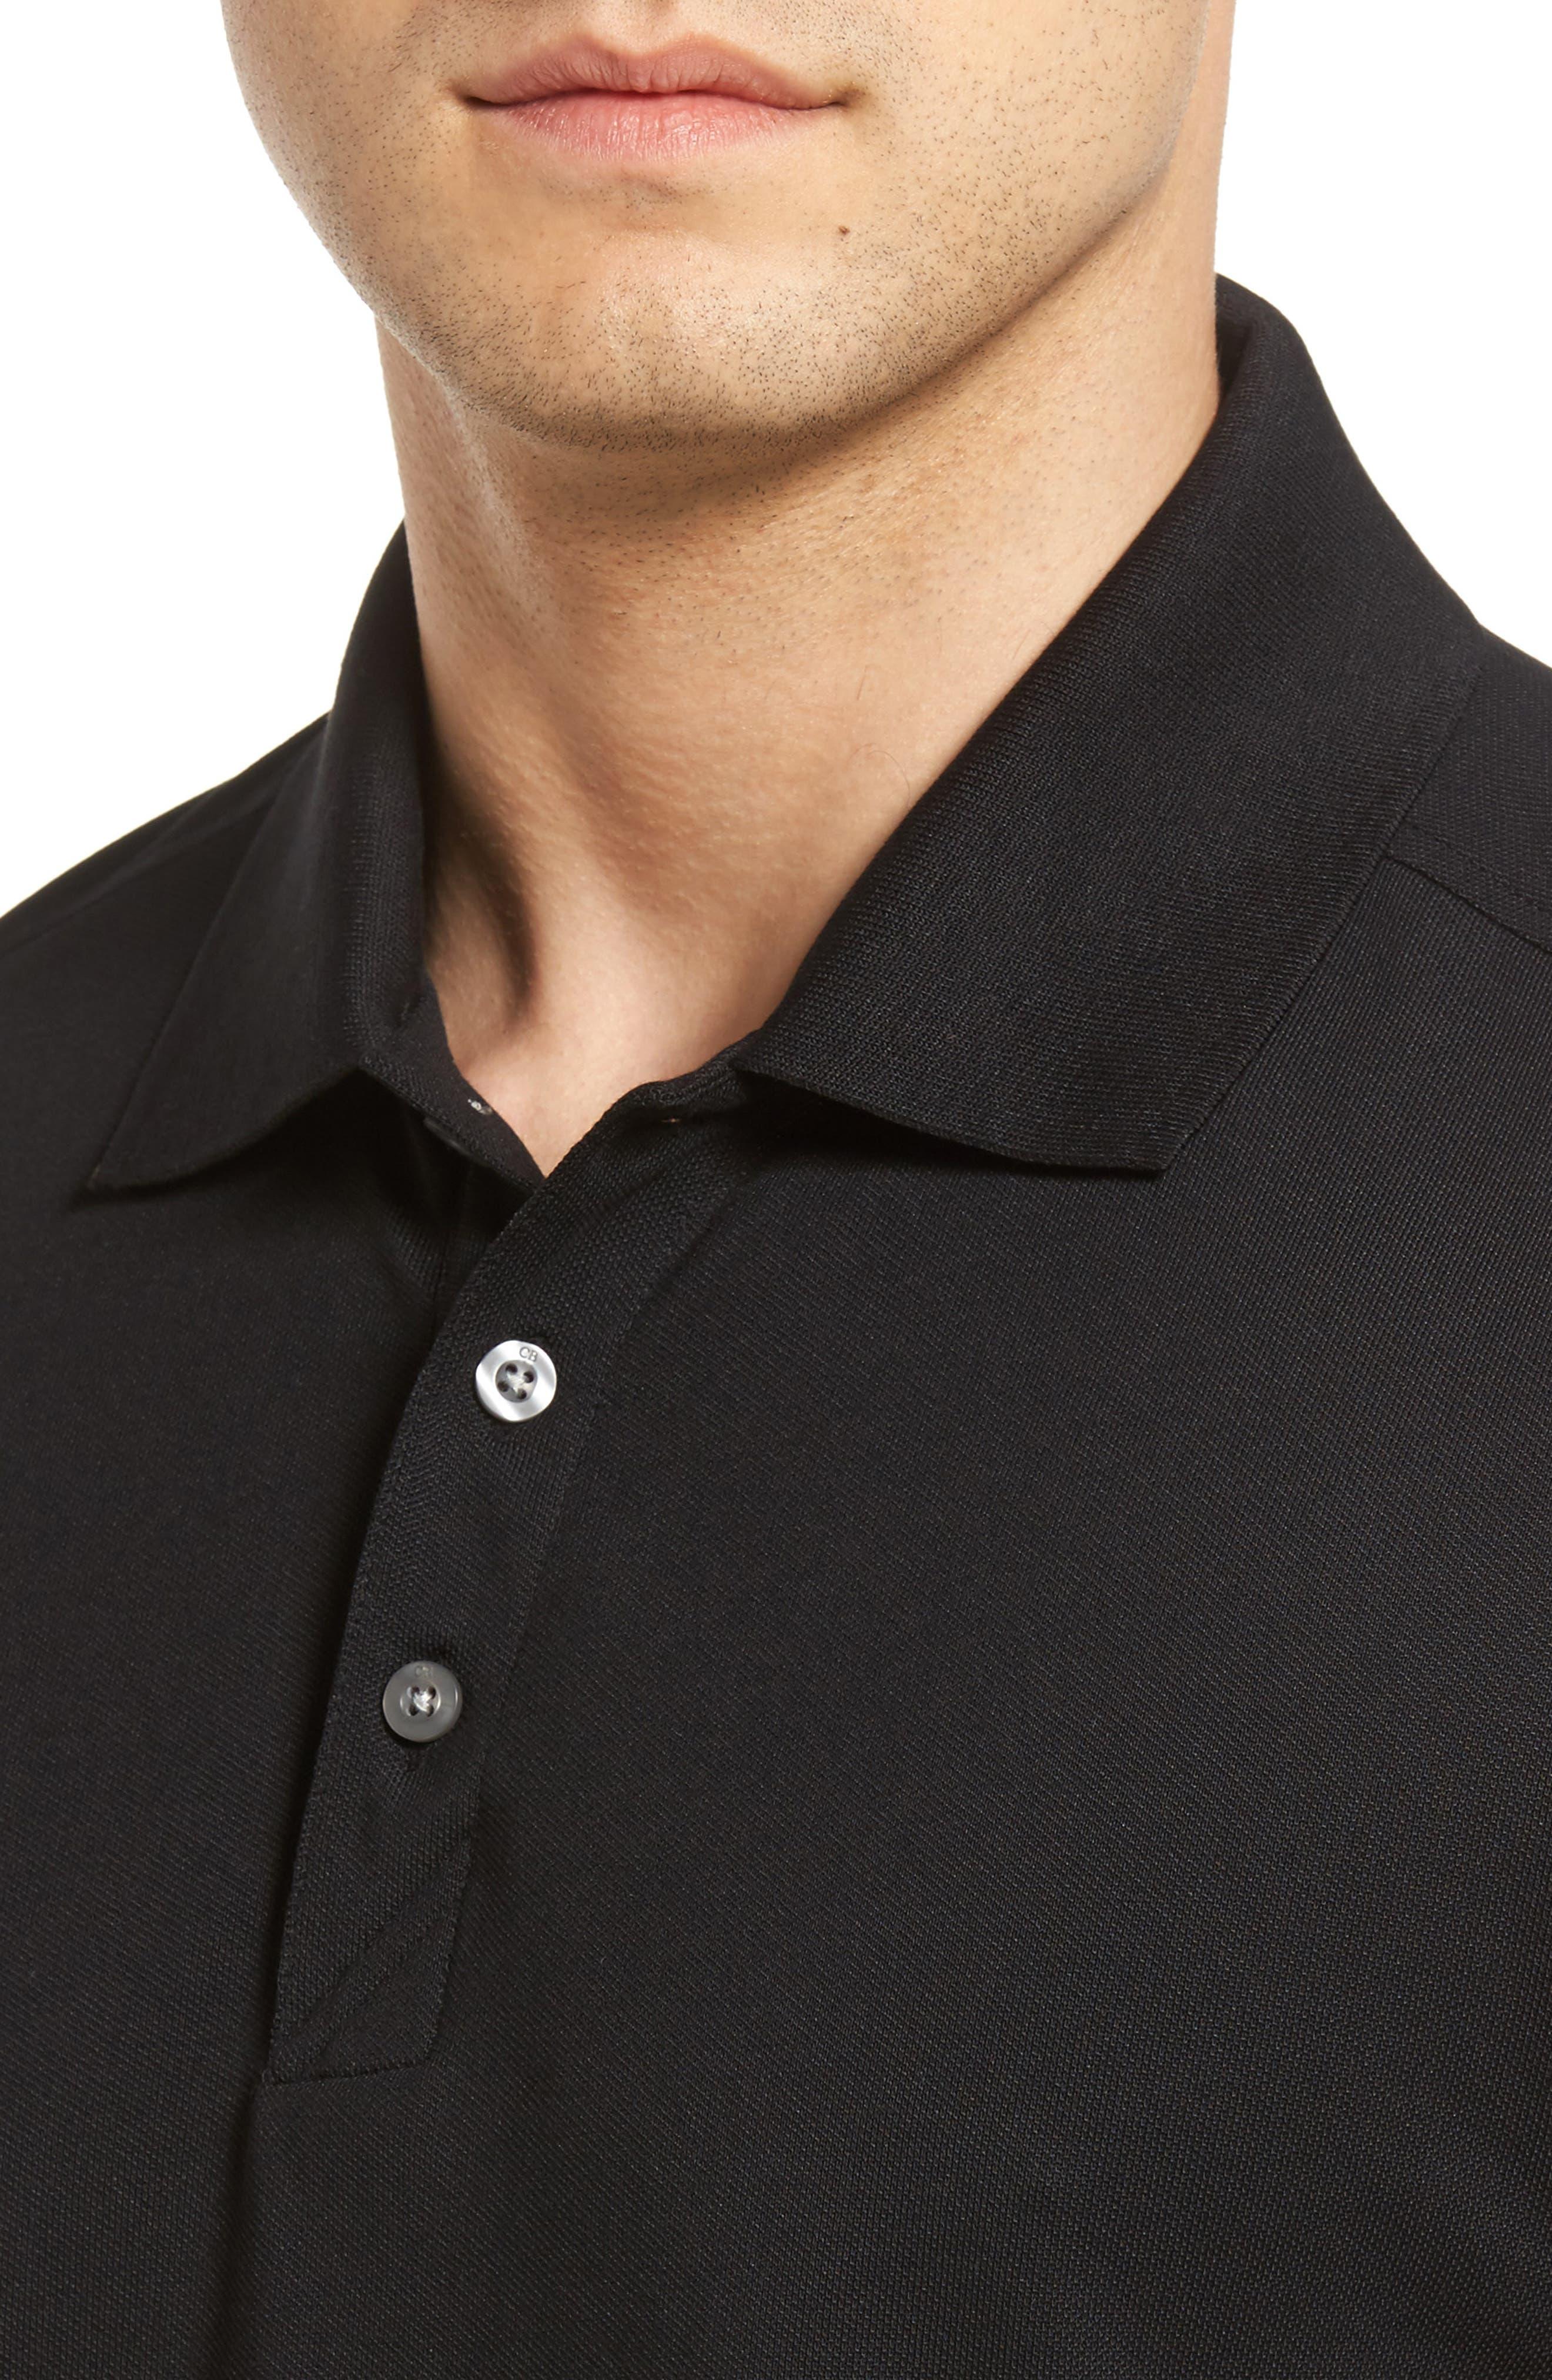 CUTTER & BUCK, Advantage Golf Polo, Alternate thumbnail 4, color, BLACK